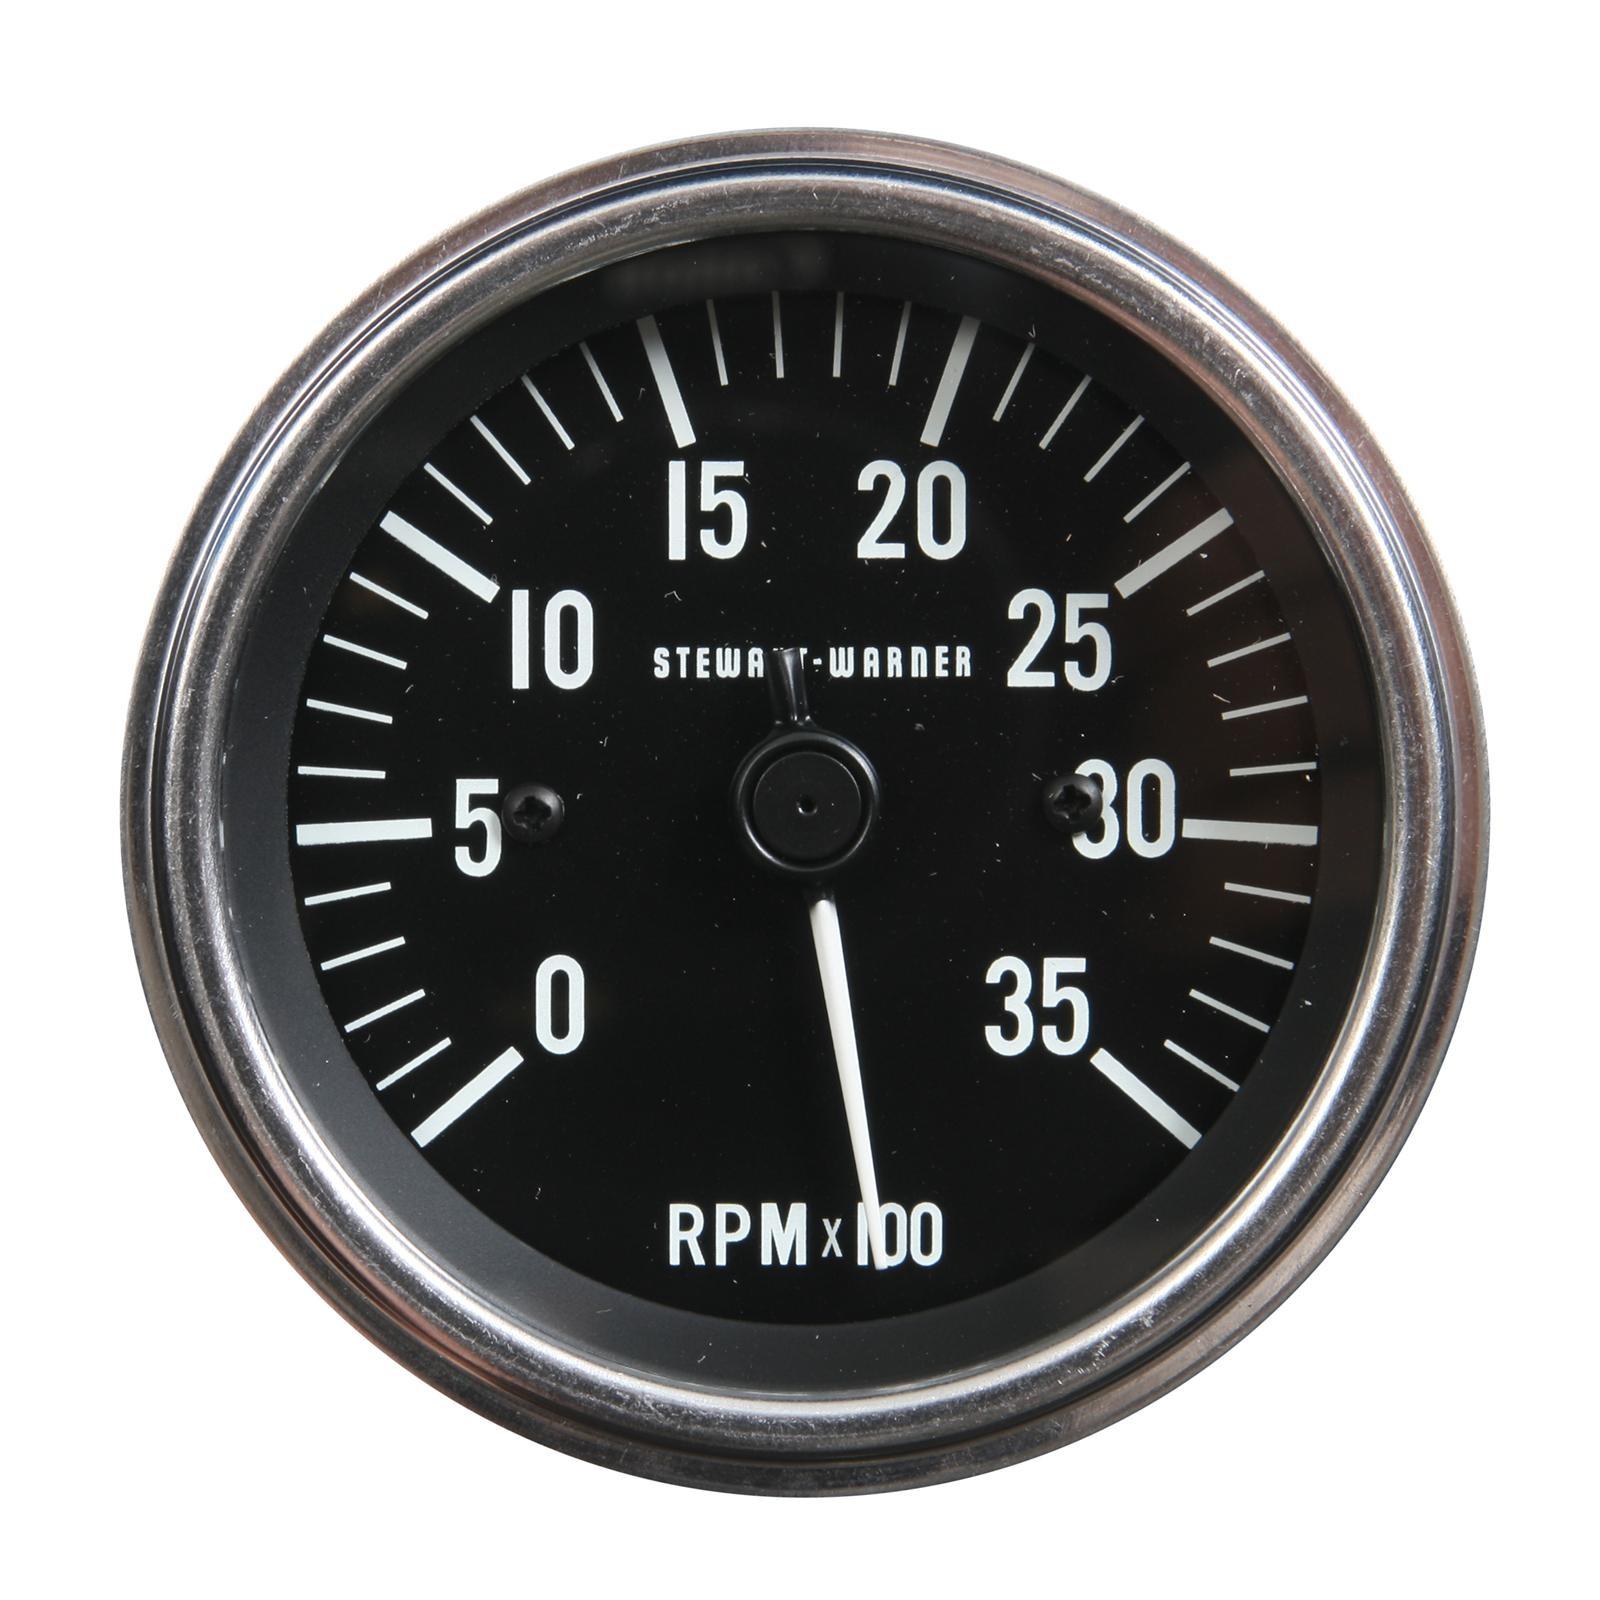 stewart warner tachometer 0 3500 rpm Digital RPM Tachometer rpm tach wiring